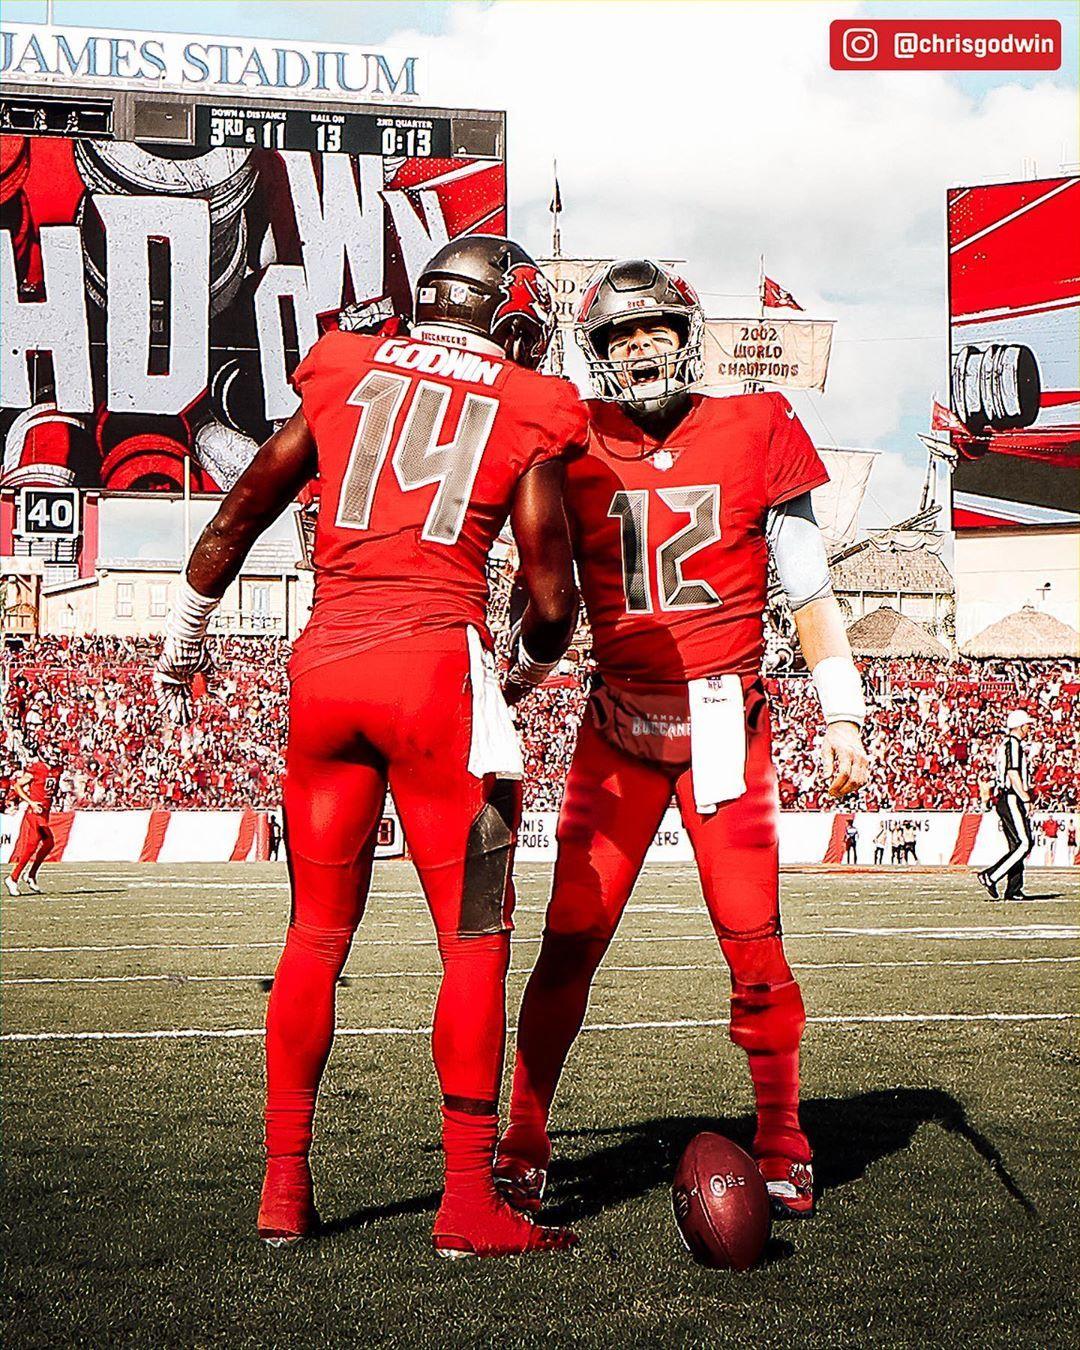 Nfl On Instagram 1 2 X1 4 Tombrady Via Chrisgodwin In 2020 Tampa Bay Buccaneers Football Buccaneers Football Tom Brady Nfl